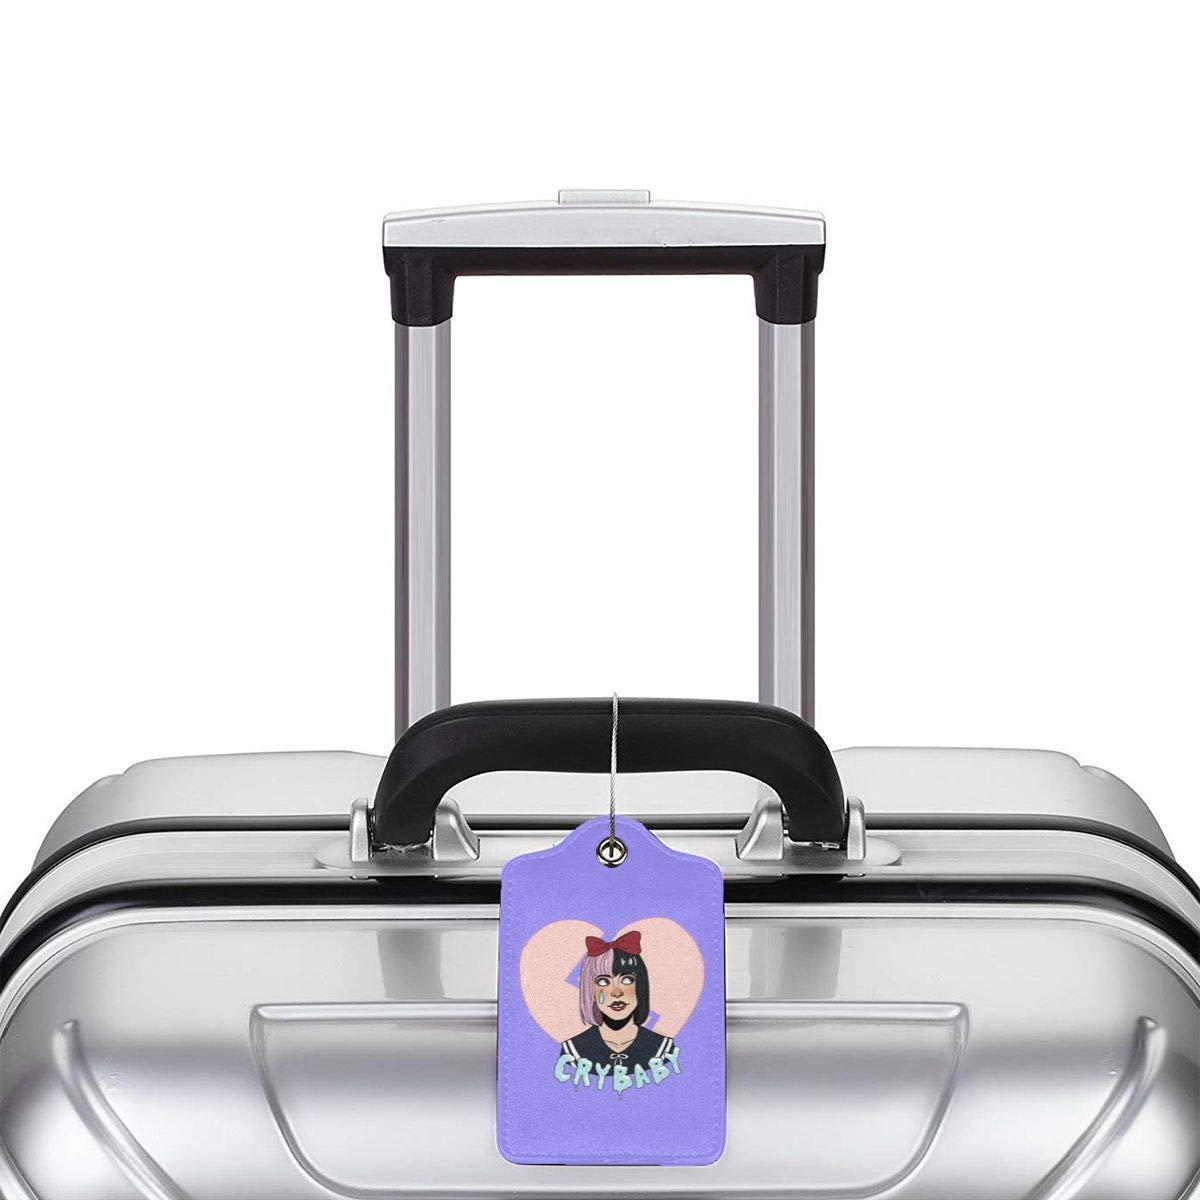 LIKUNMING Melanie Martinez Travel Luggage Tags Travel Suitcase Bag Labels Checked Baggage Tags